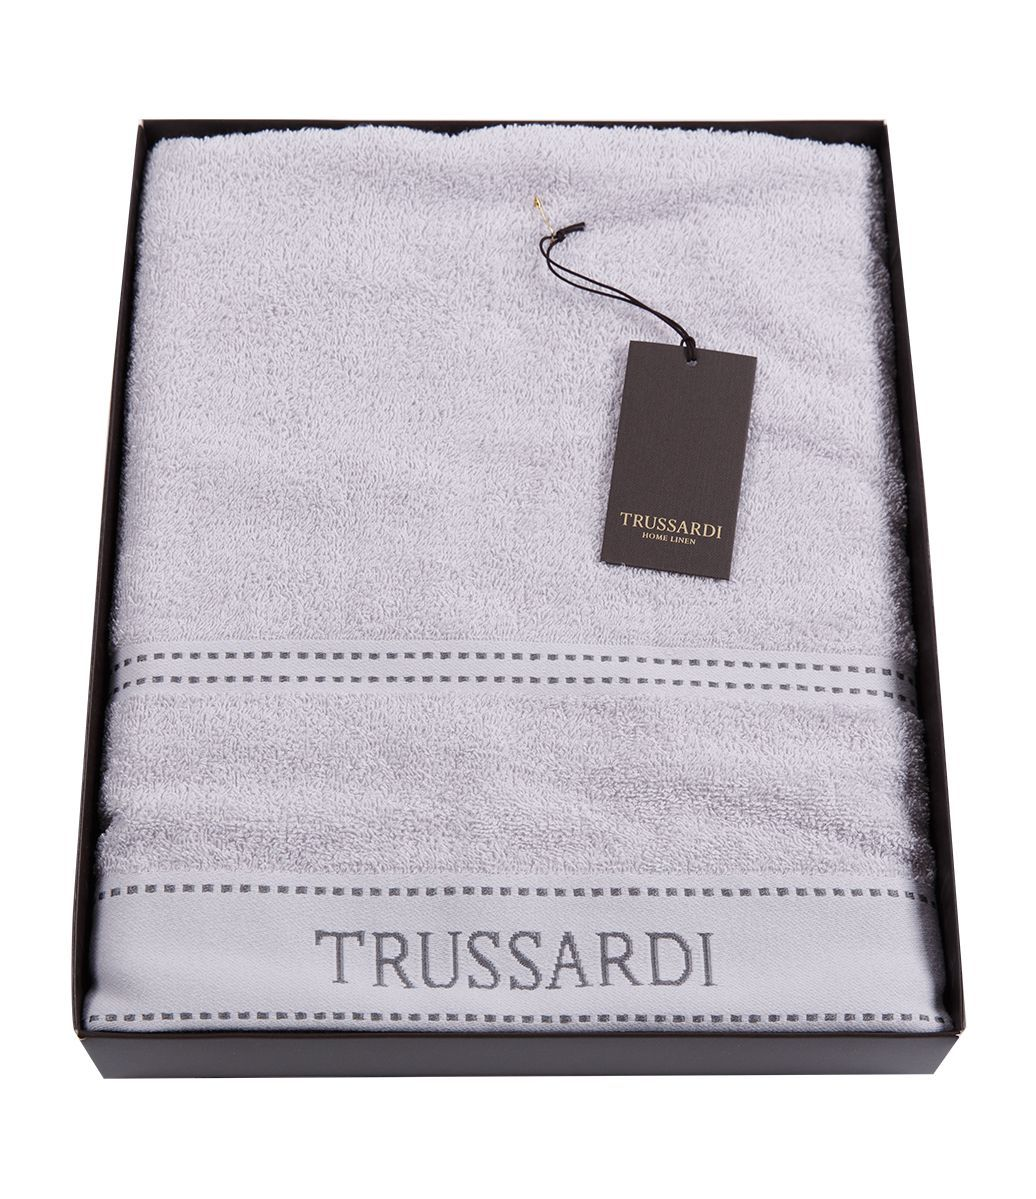 Наборы полотенец Набор полотенец 2 шт Trussardi Ribbon Pearl grey nabor-polotenets-2-sht-trussardi-ribbon-pearl-grey-italiya.jpg